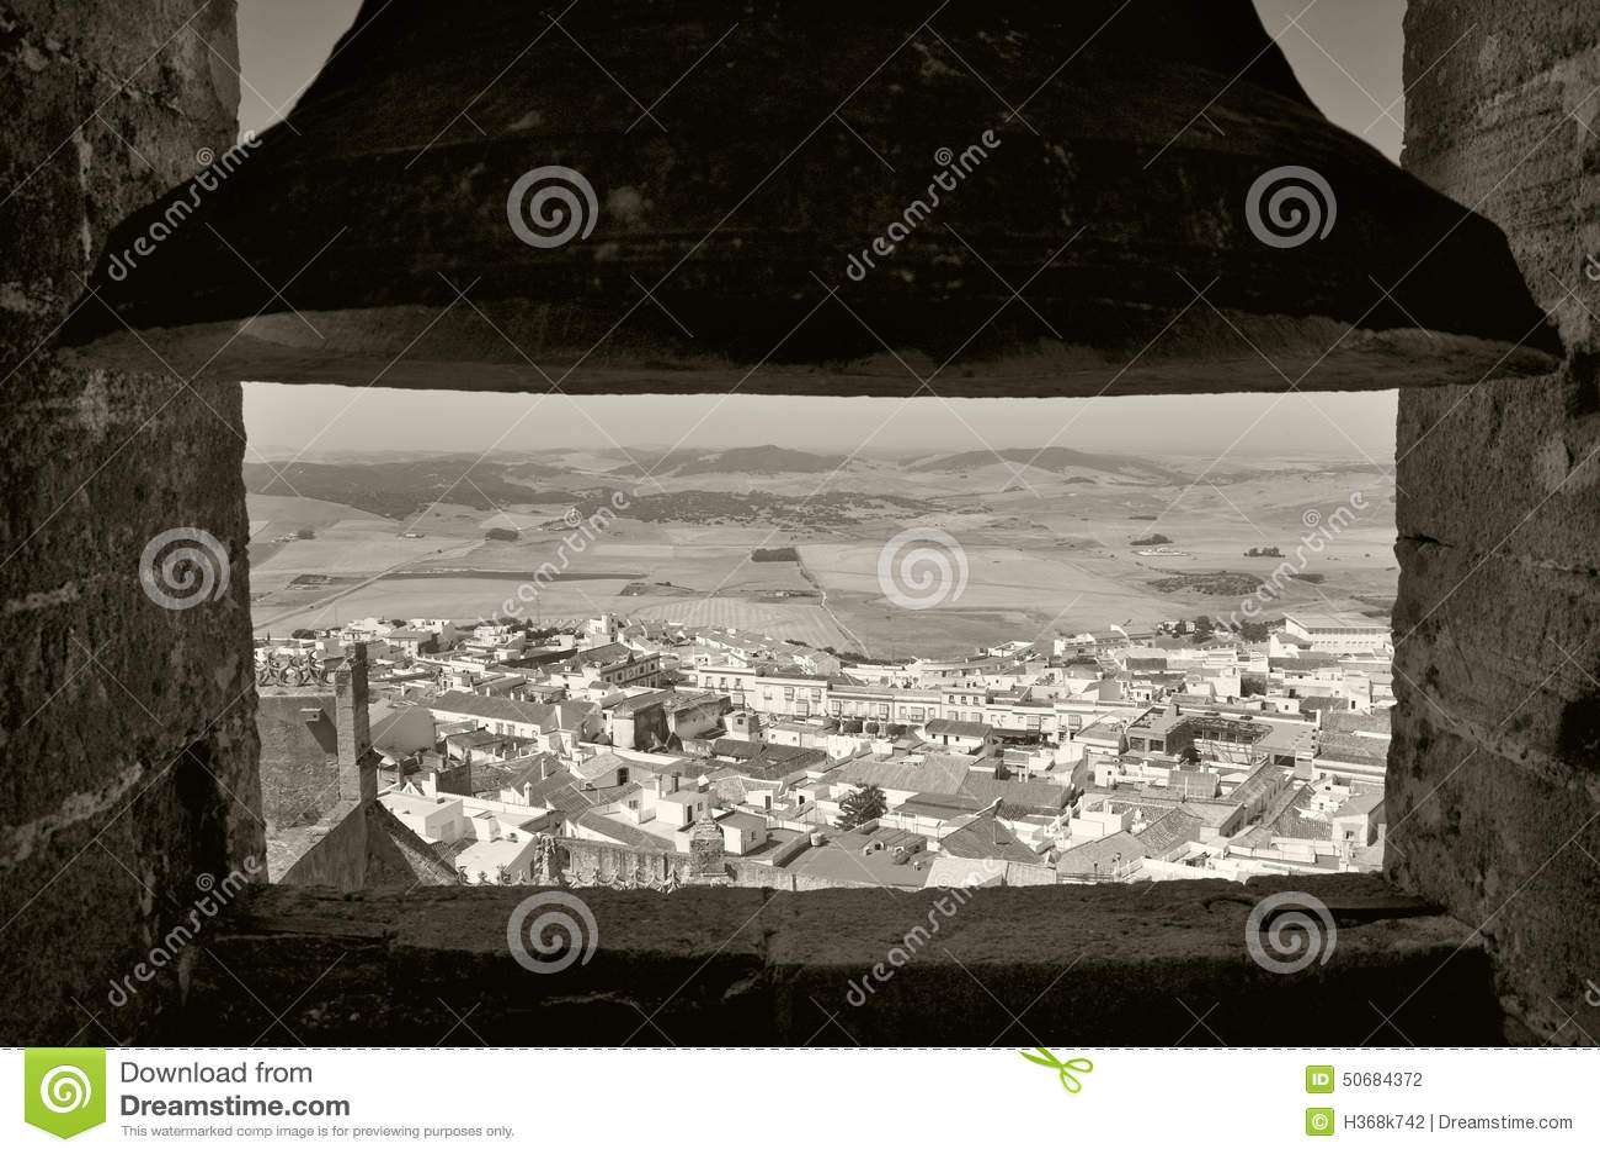 Download 从一座钟楼的安达卢西亚的村庄视图在西班牙 库存照片. 图片 包括有 城市, 视图, 西班牙语, 乡下, 沈默 - 50684372